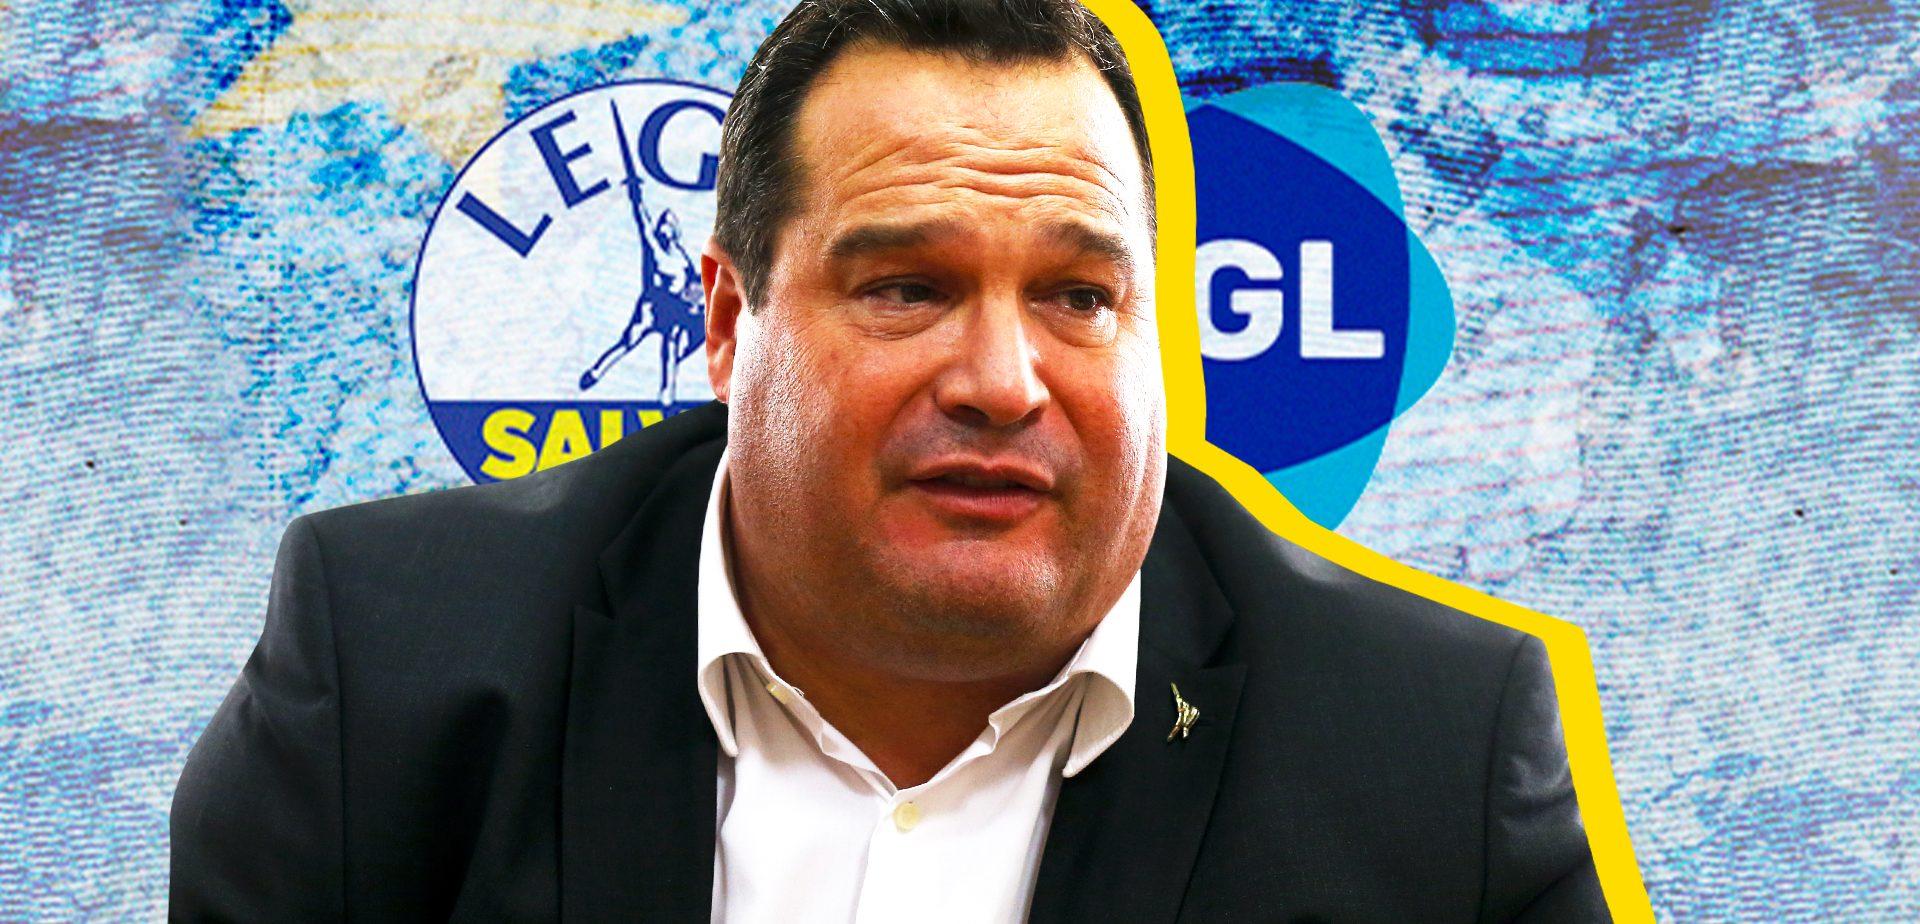 Follow the money: inchiesta sul caso Durigon